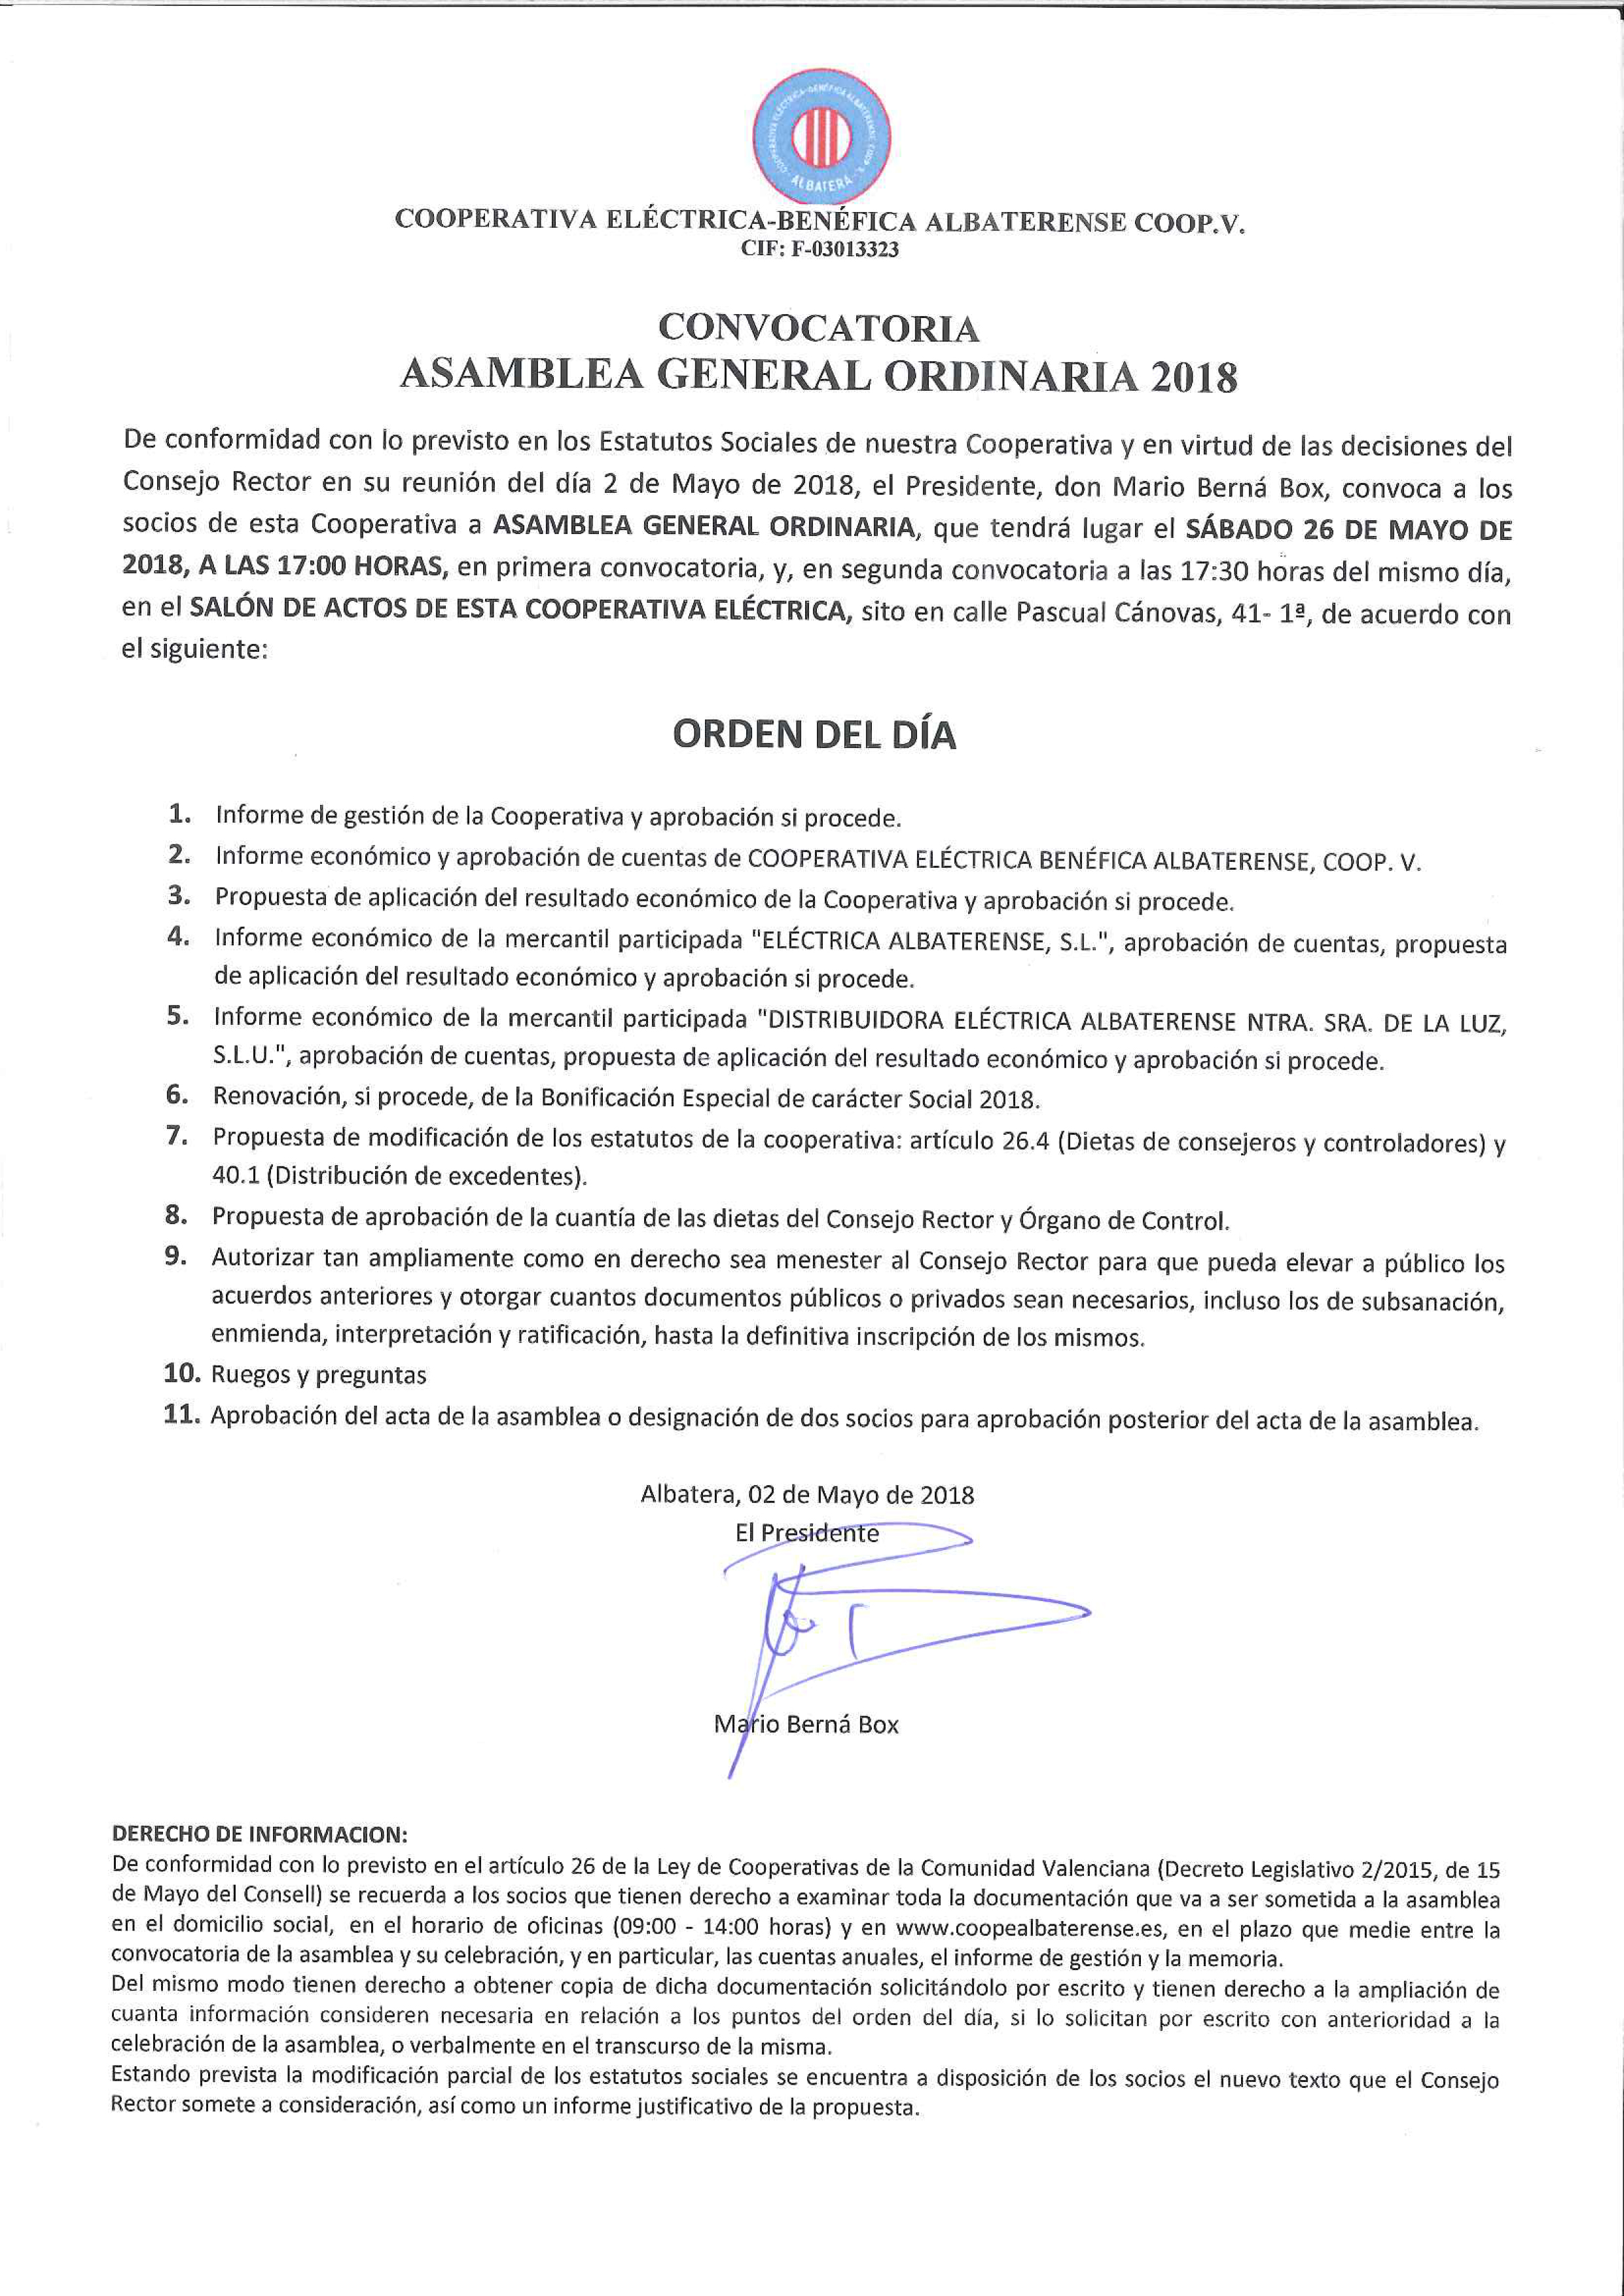 Convocatoria Asamblea Cooperativa mayo 2018